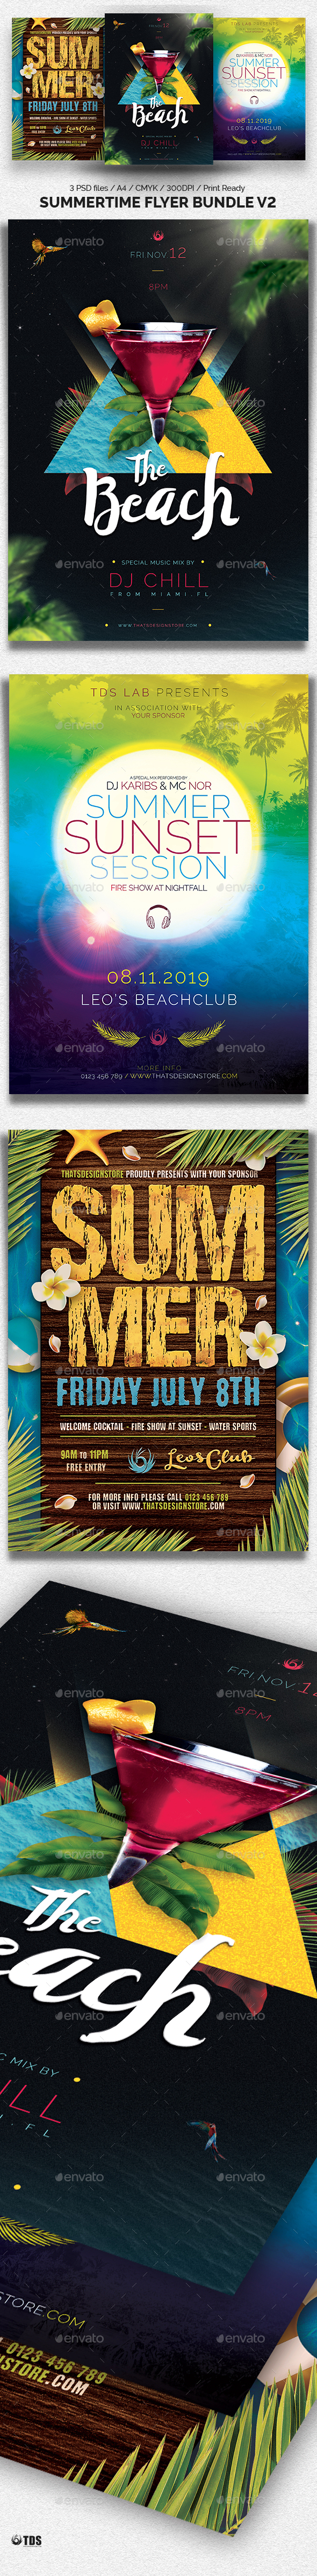 Summertime Flyer Bundle V2 - Clubs & Parties Events